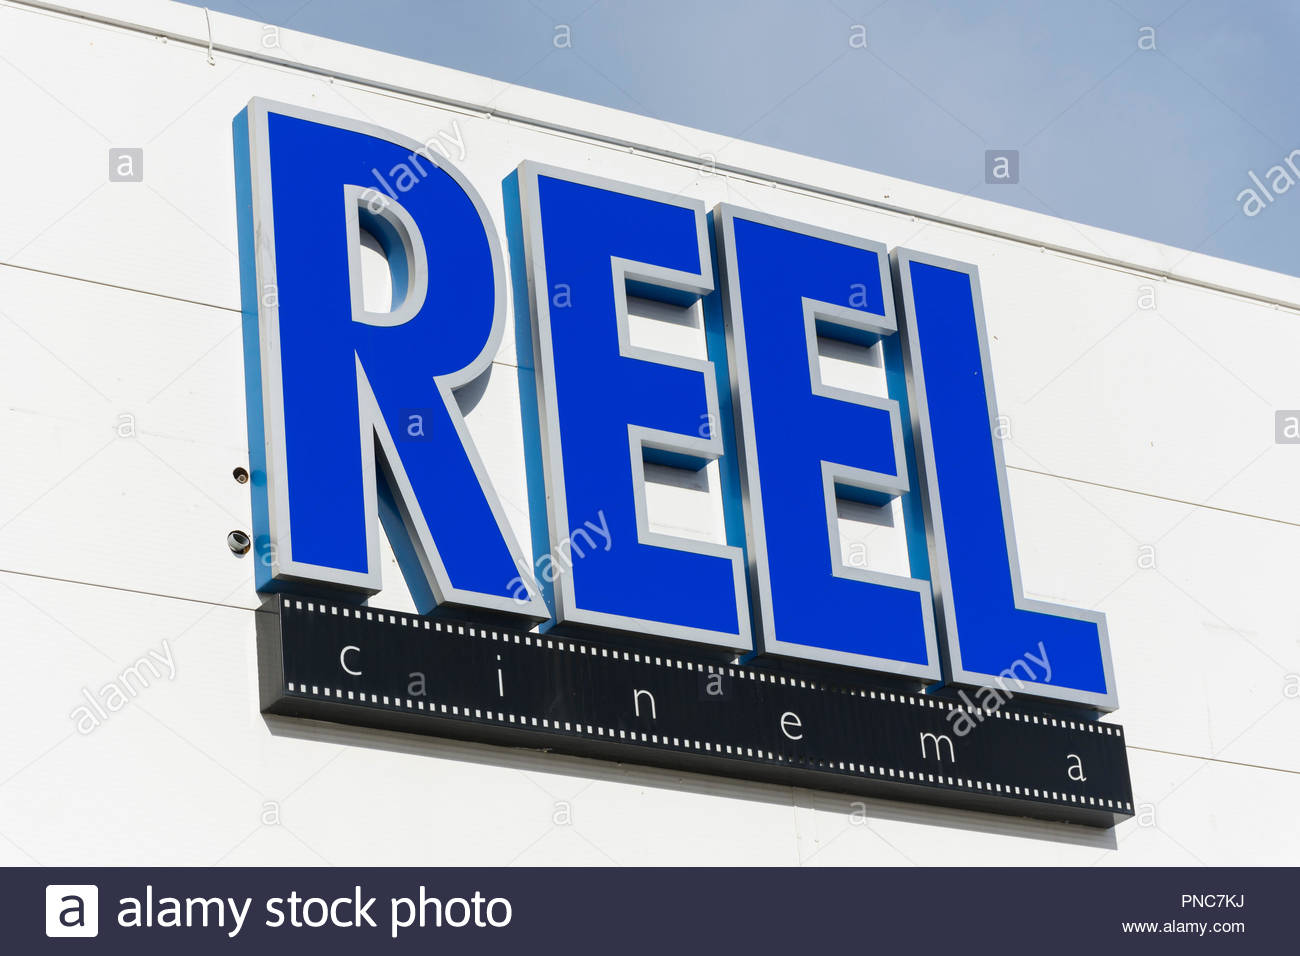 The Reel Cinema in Morecambe, Lancashire - Stock Image